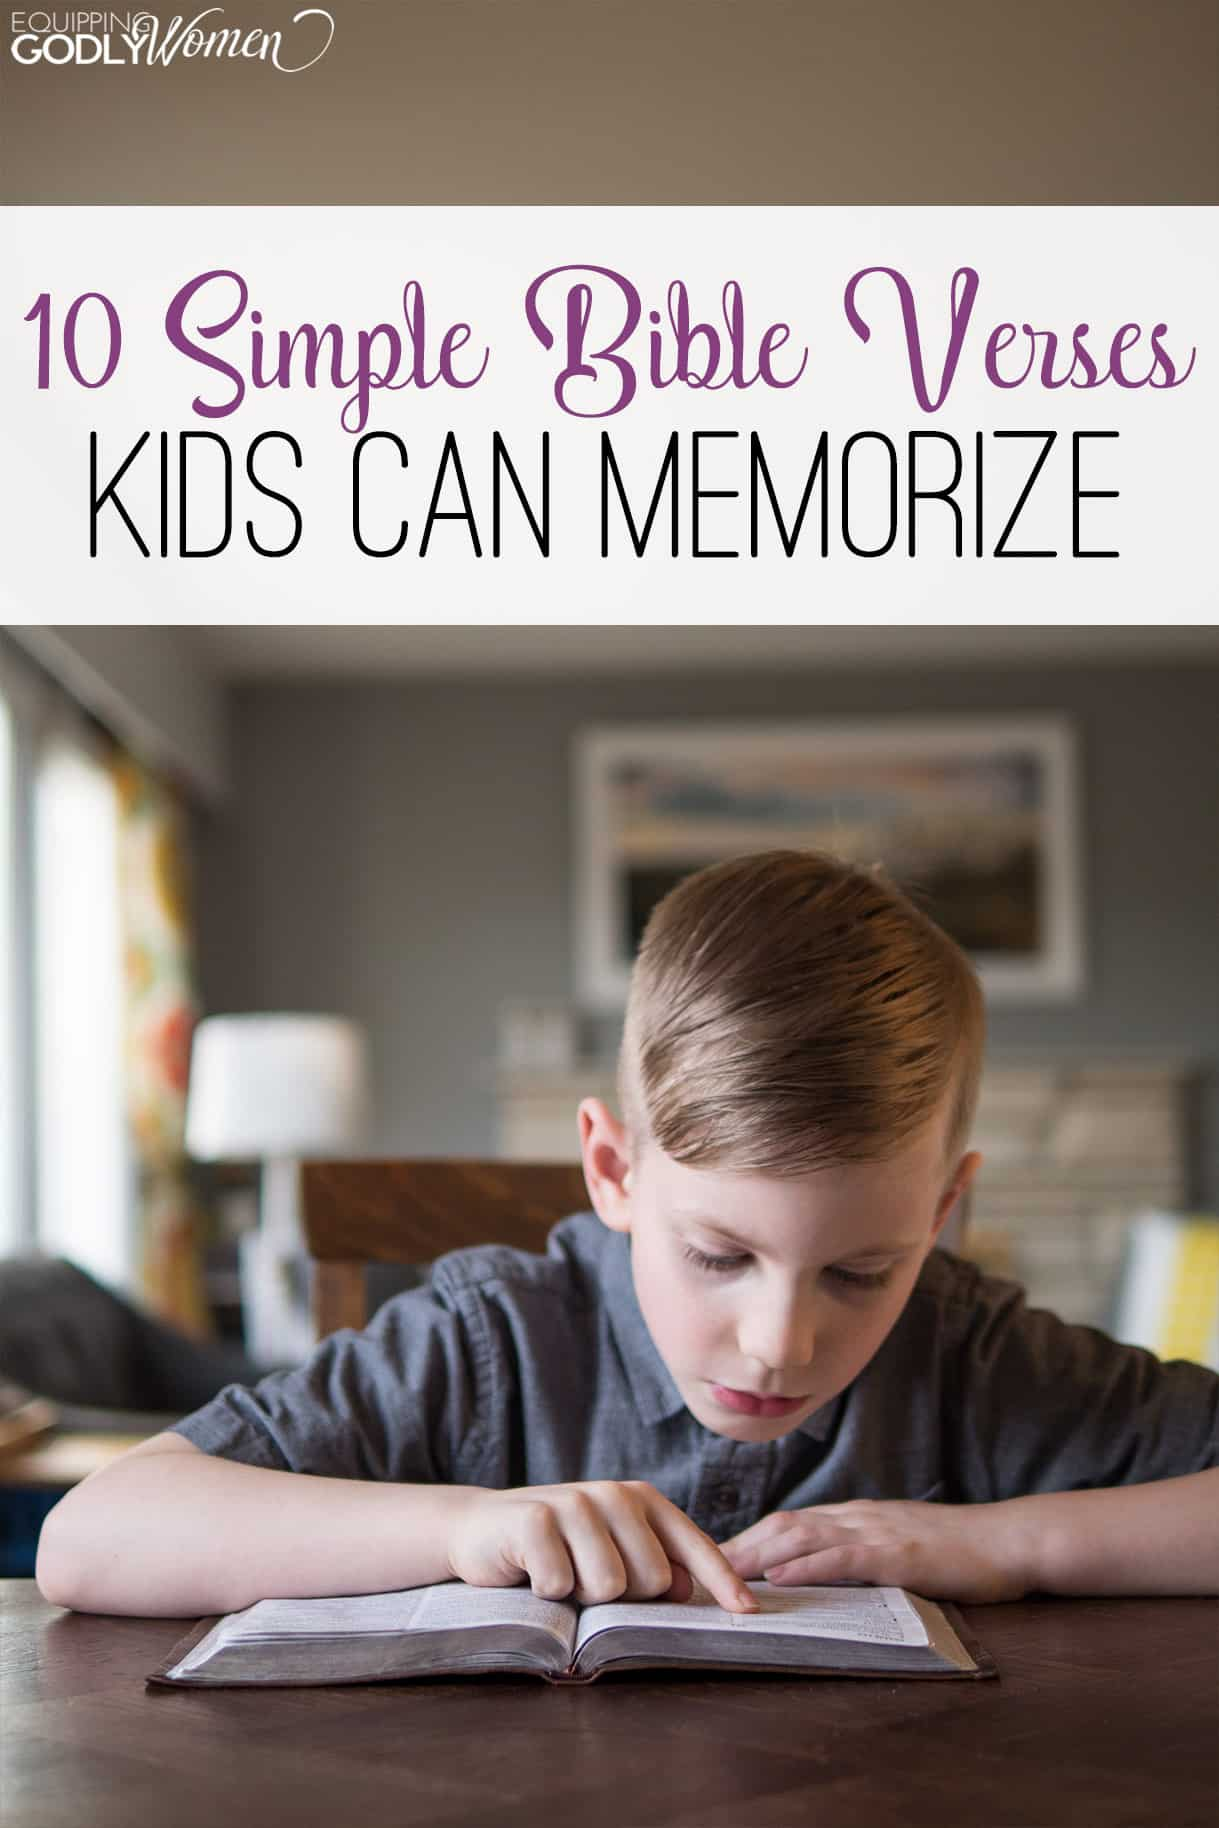 10 Simple Bible Verses Kids Can Memorize